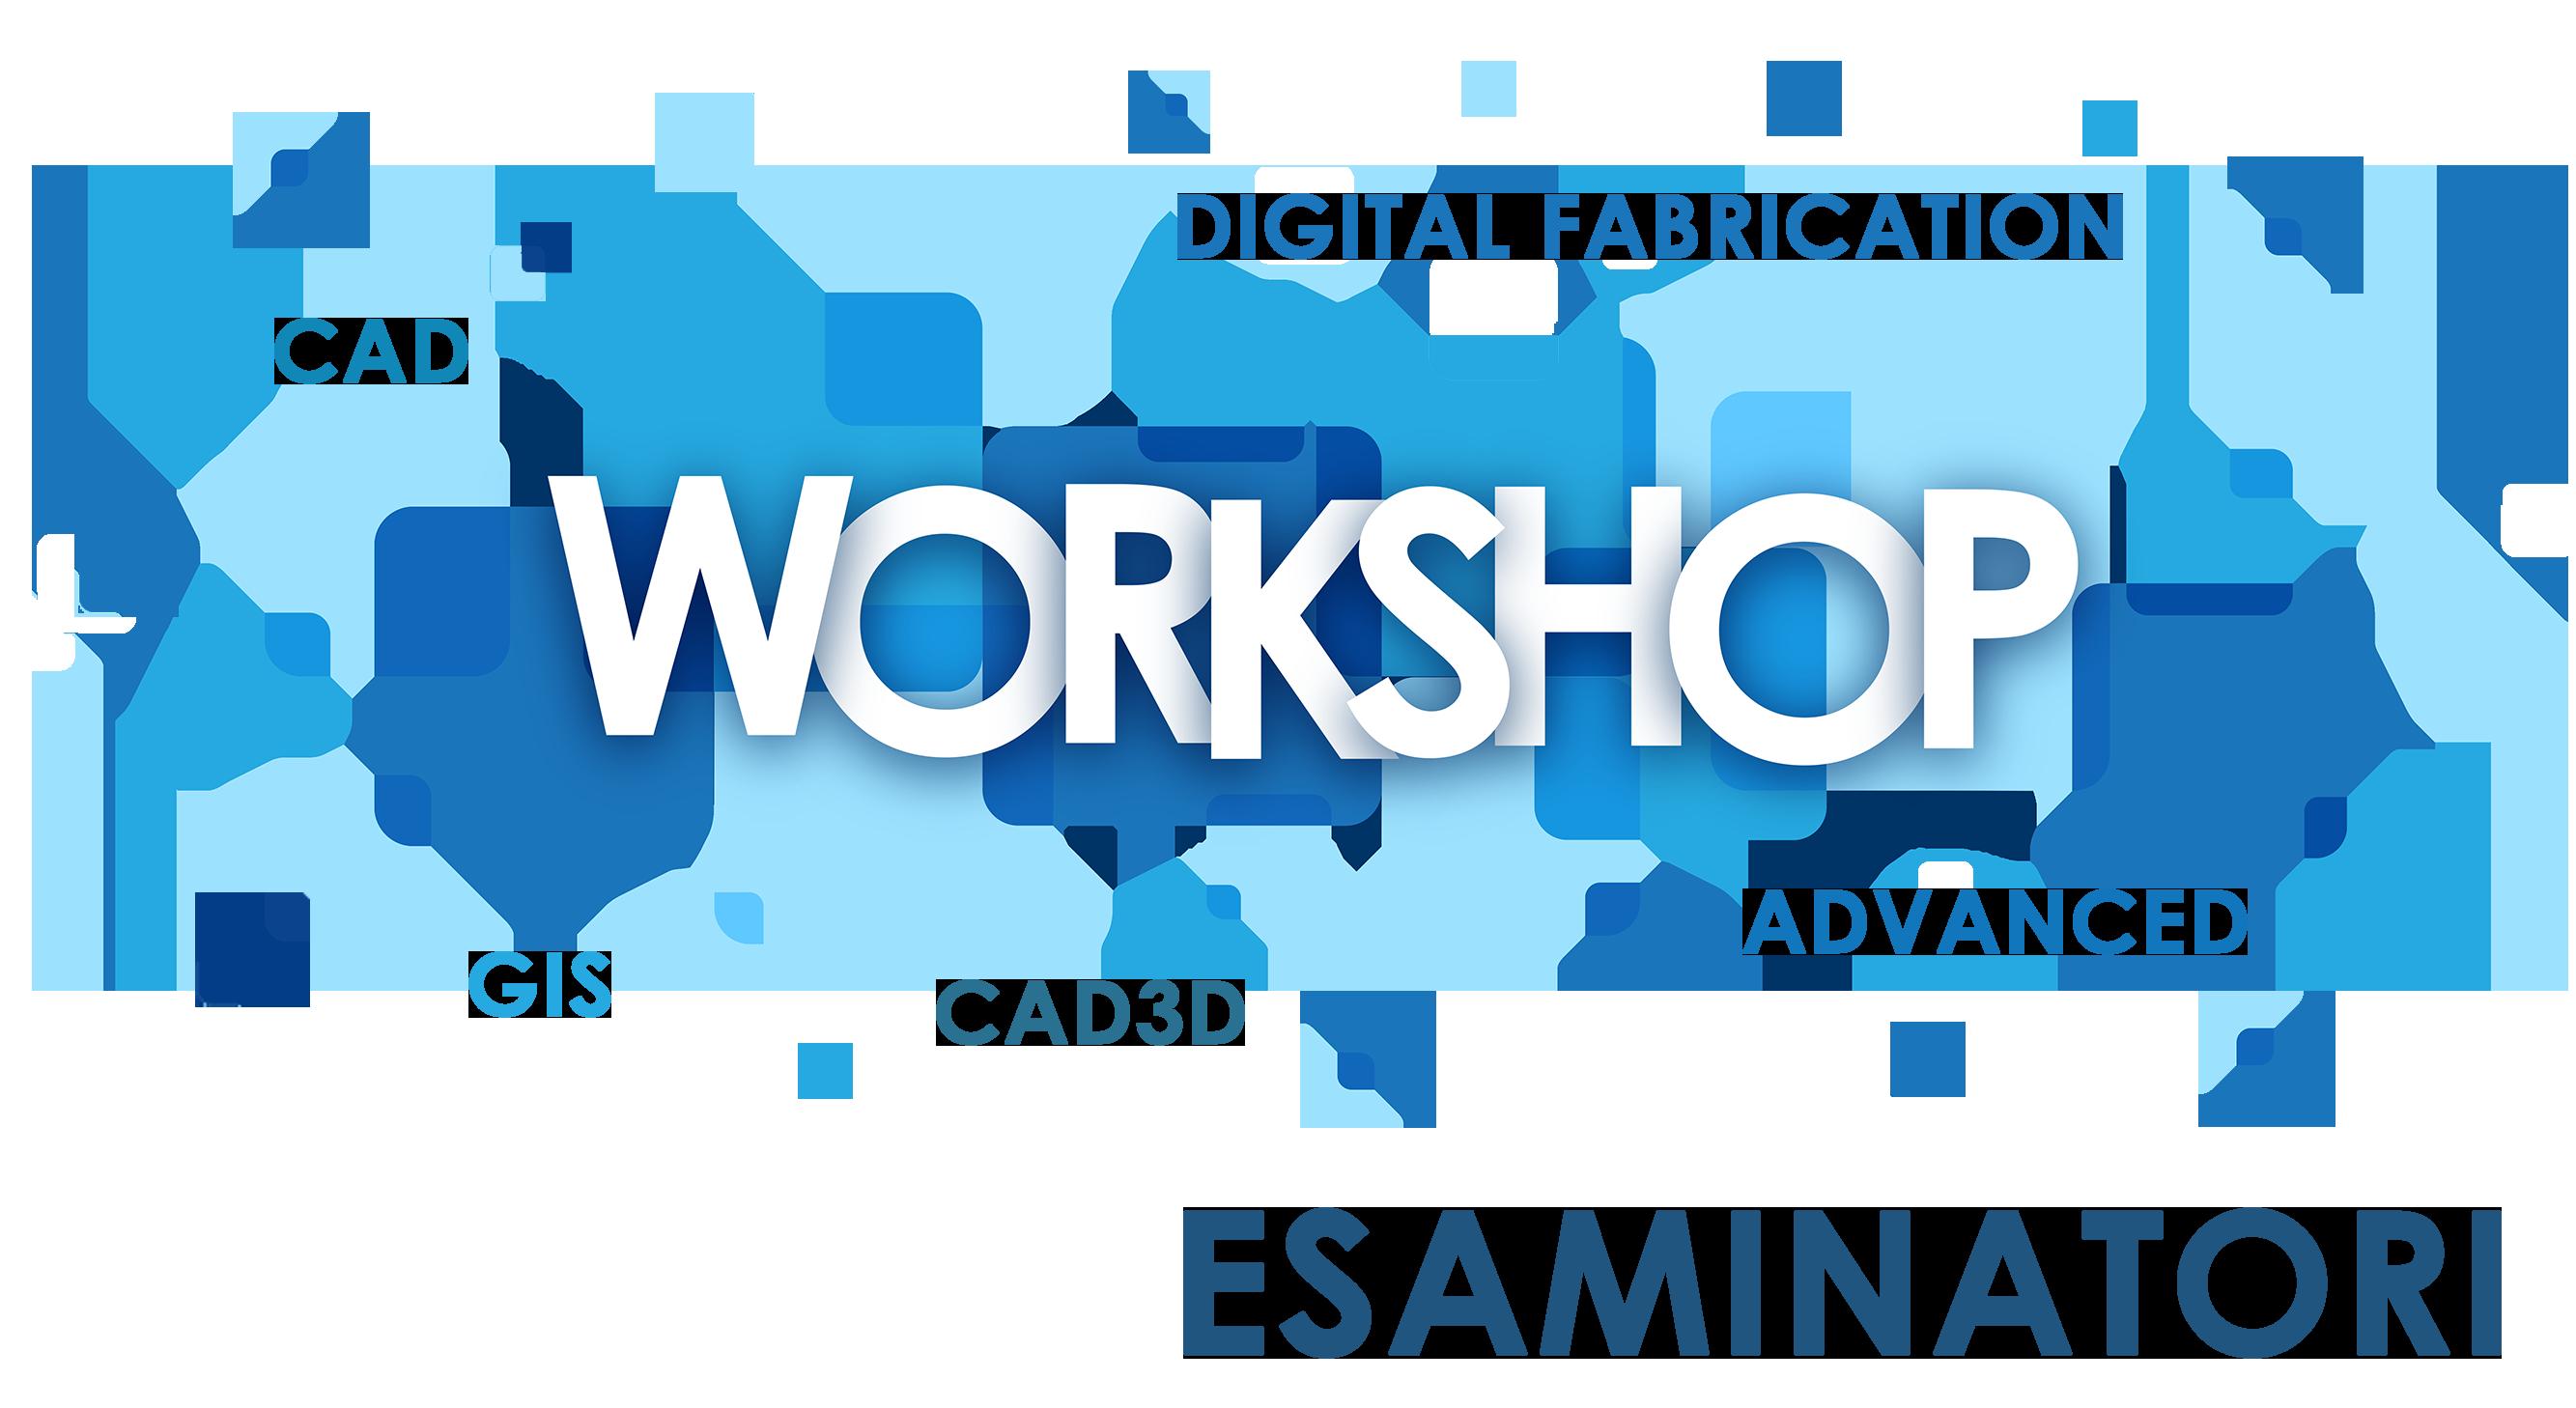 Workshop aggiornamento Esaminatori Advanced 3.0